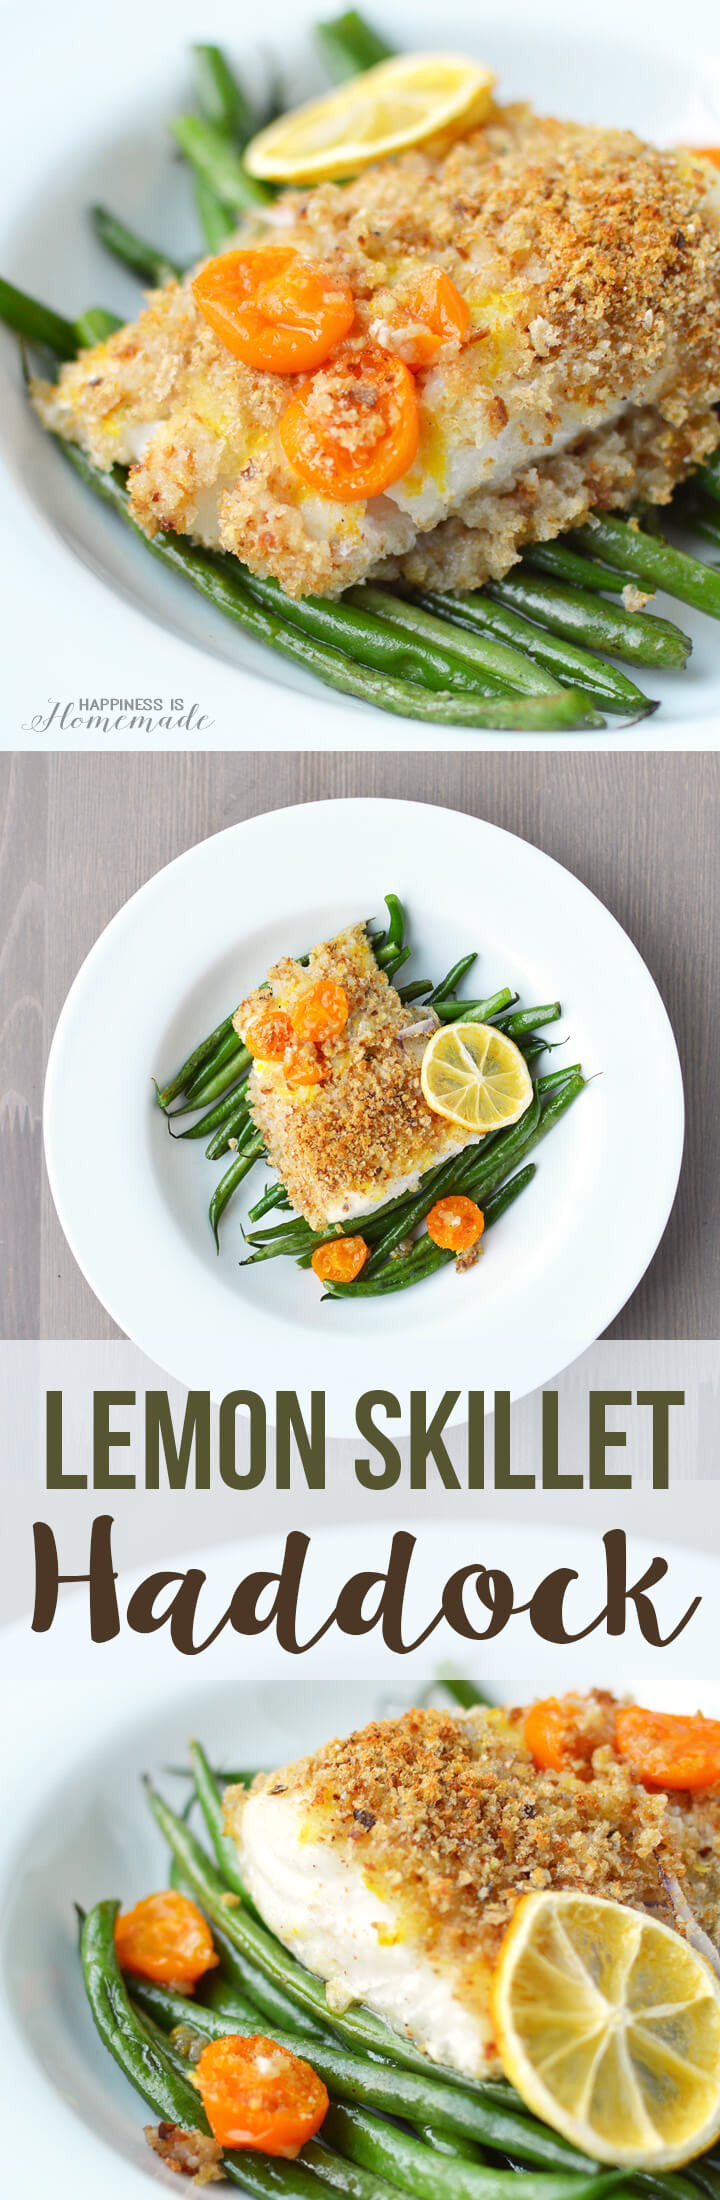 Lemon Skillet Haddock